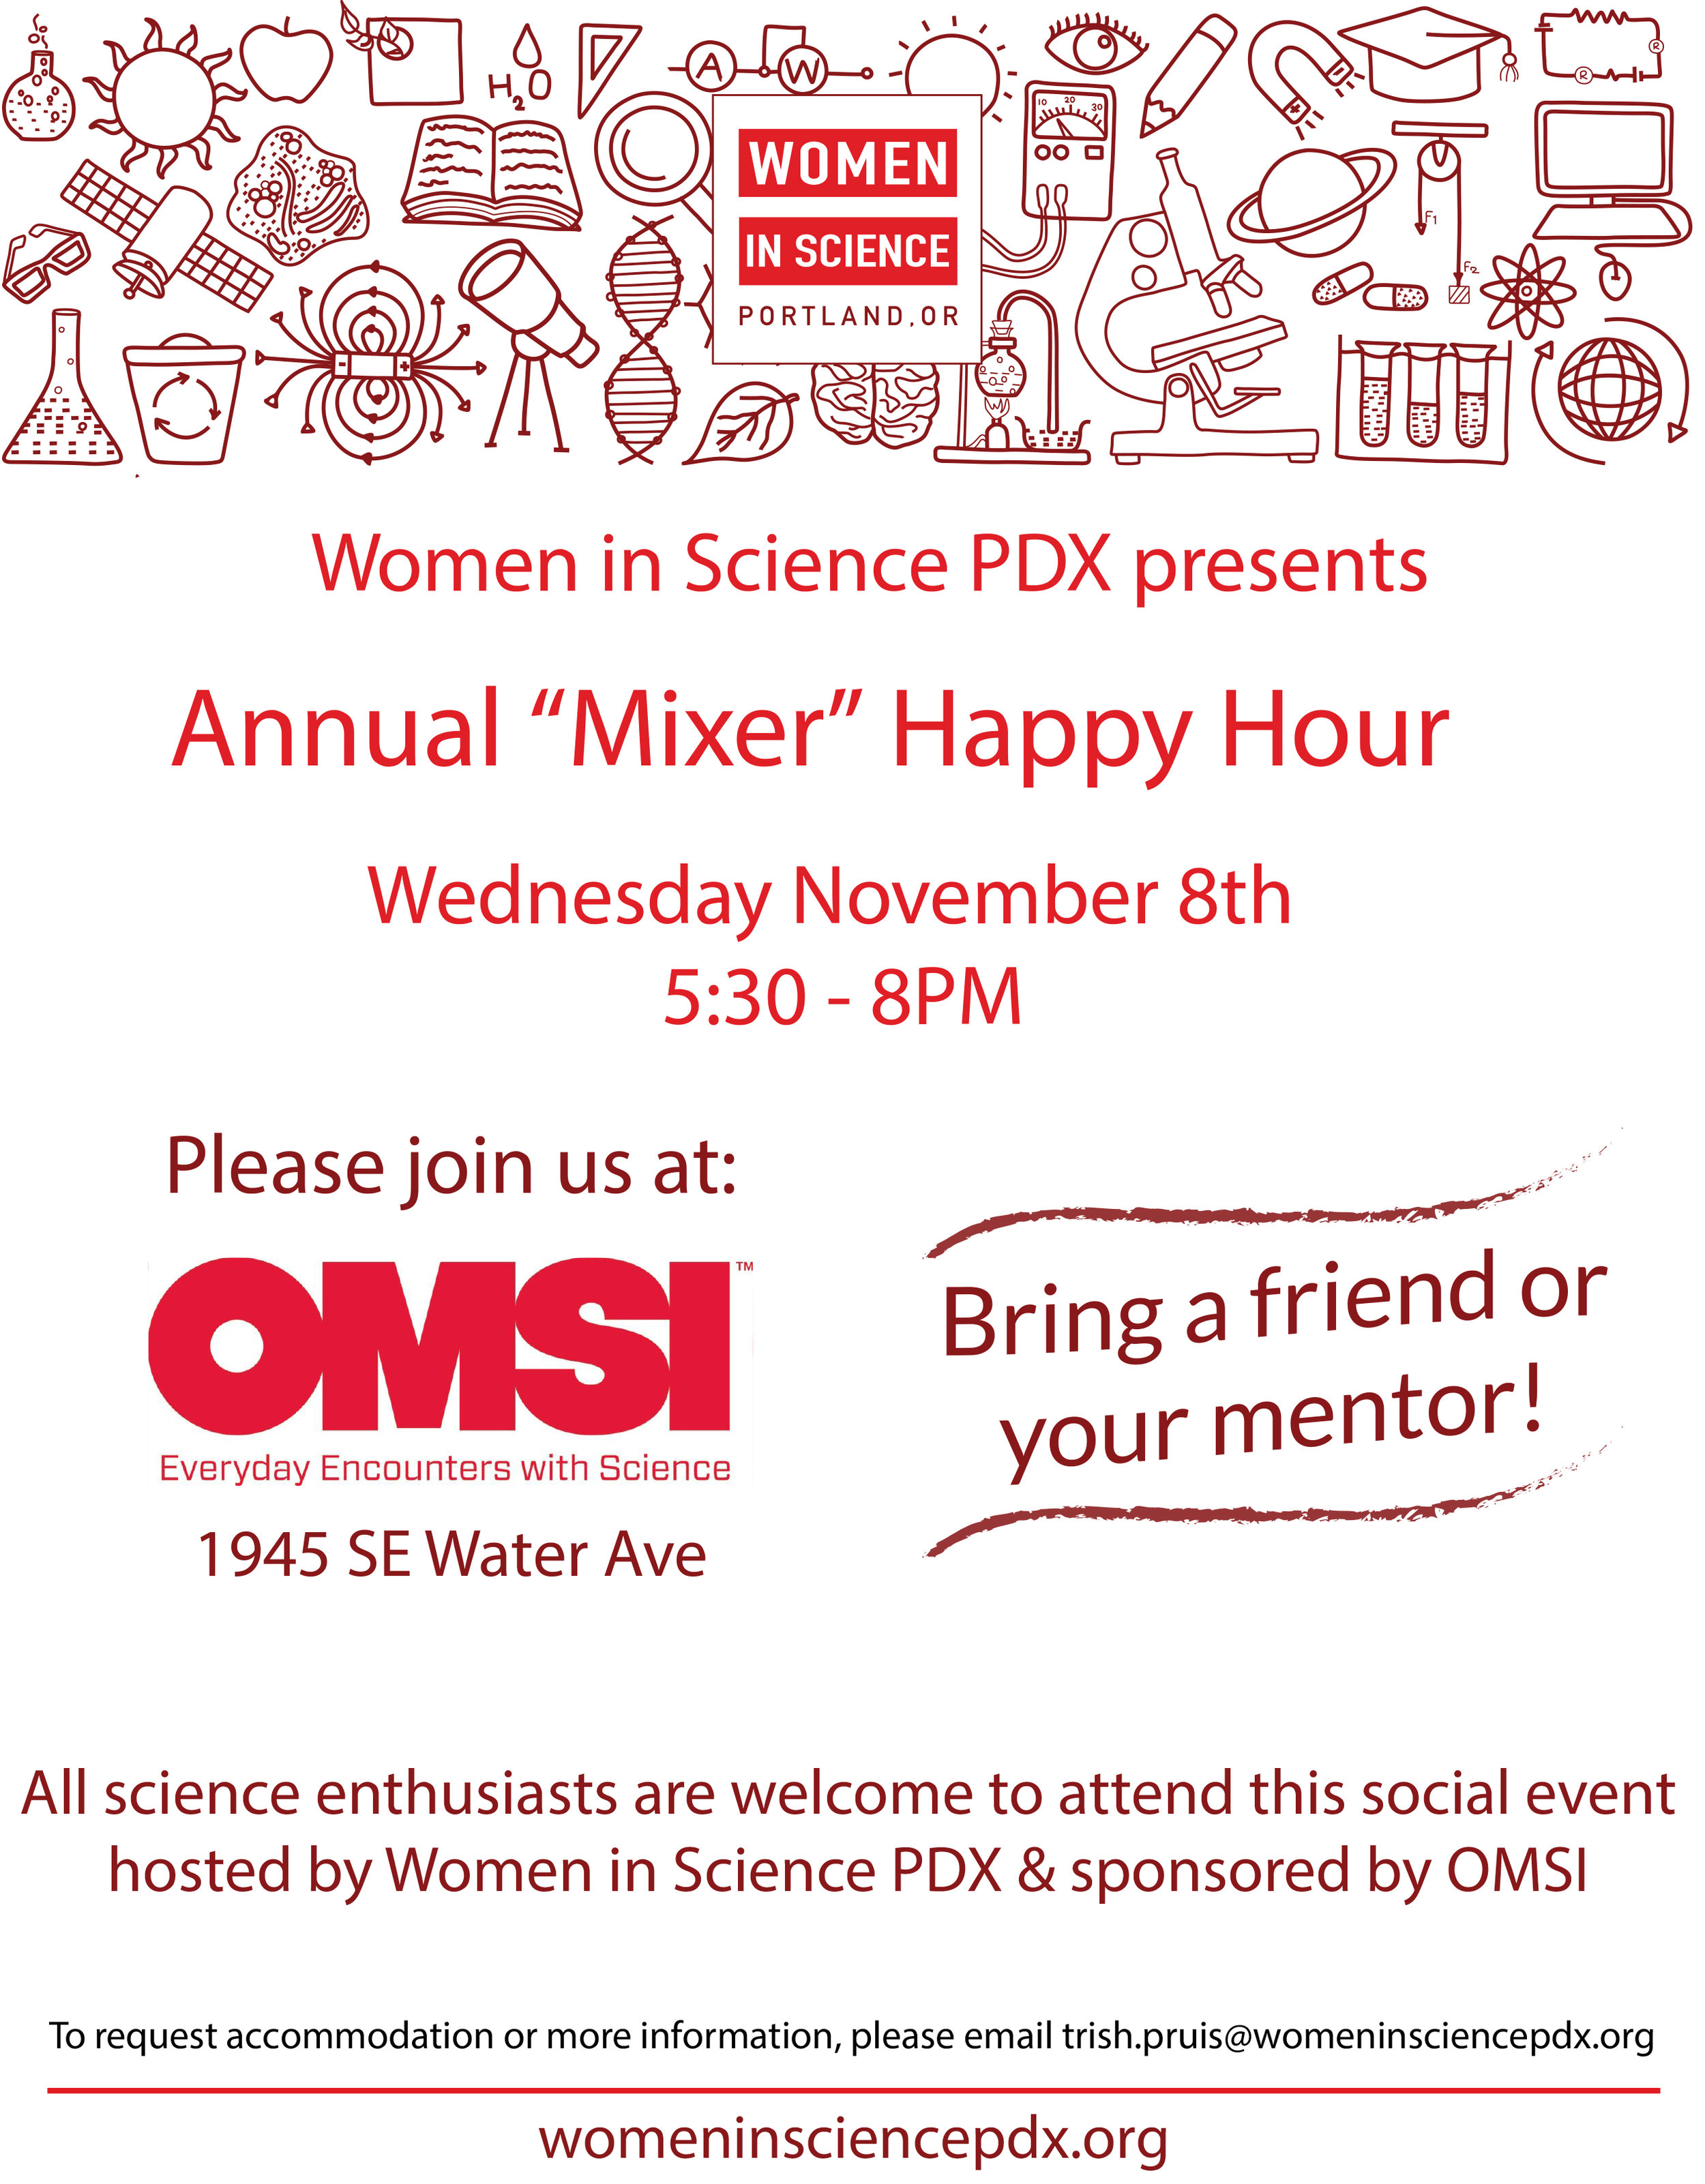 Women in Science PDX Annual Mixer 2017 11 08.jpg